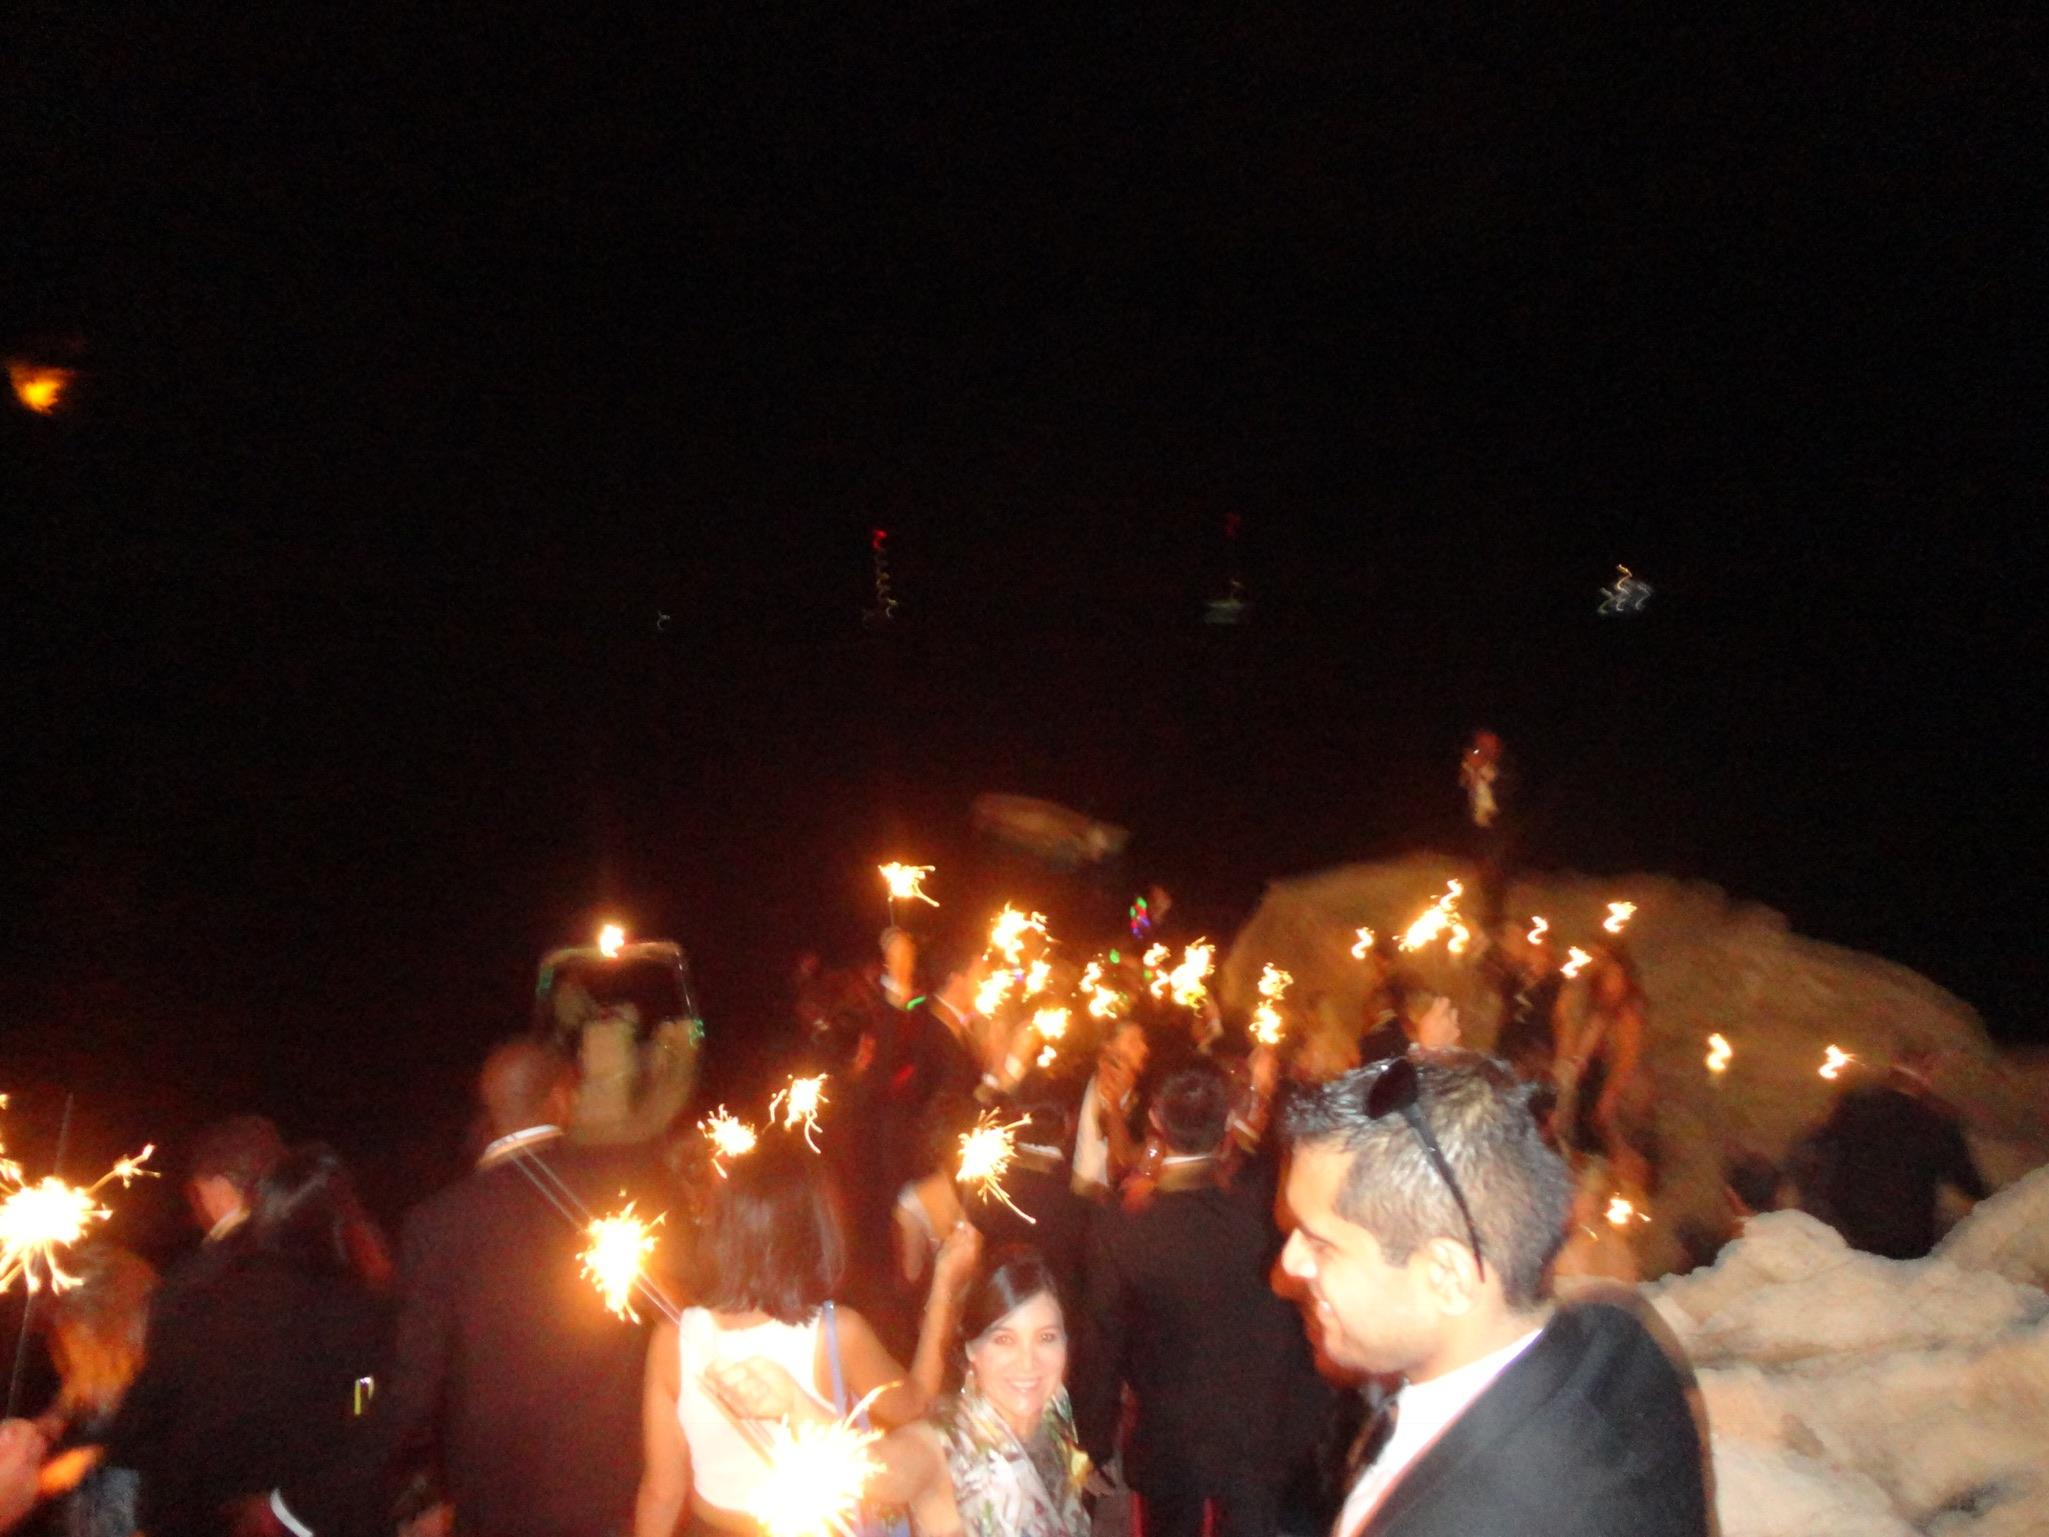 http://www.weddingamalfi.com/wp-content/uploads/Nathalie-and-Benjamin-wedding-in-Positano-24.jpg